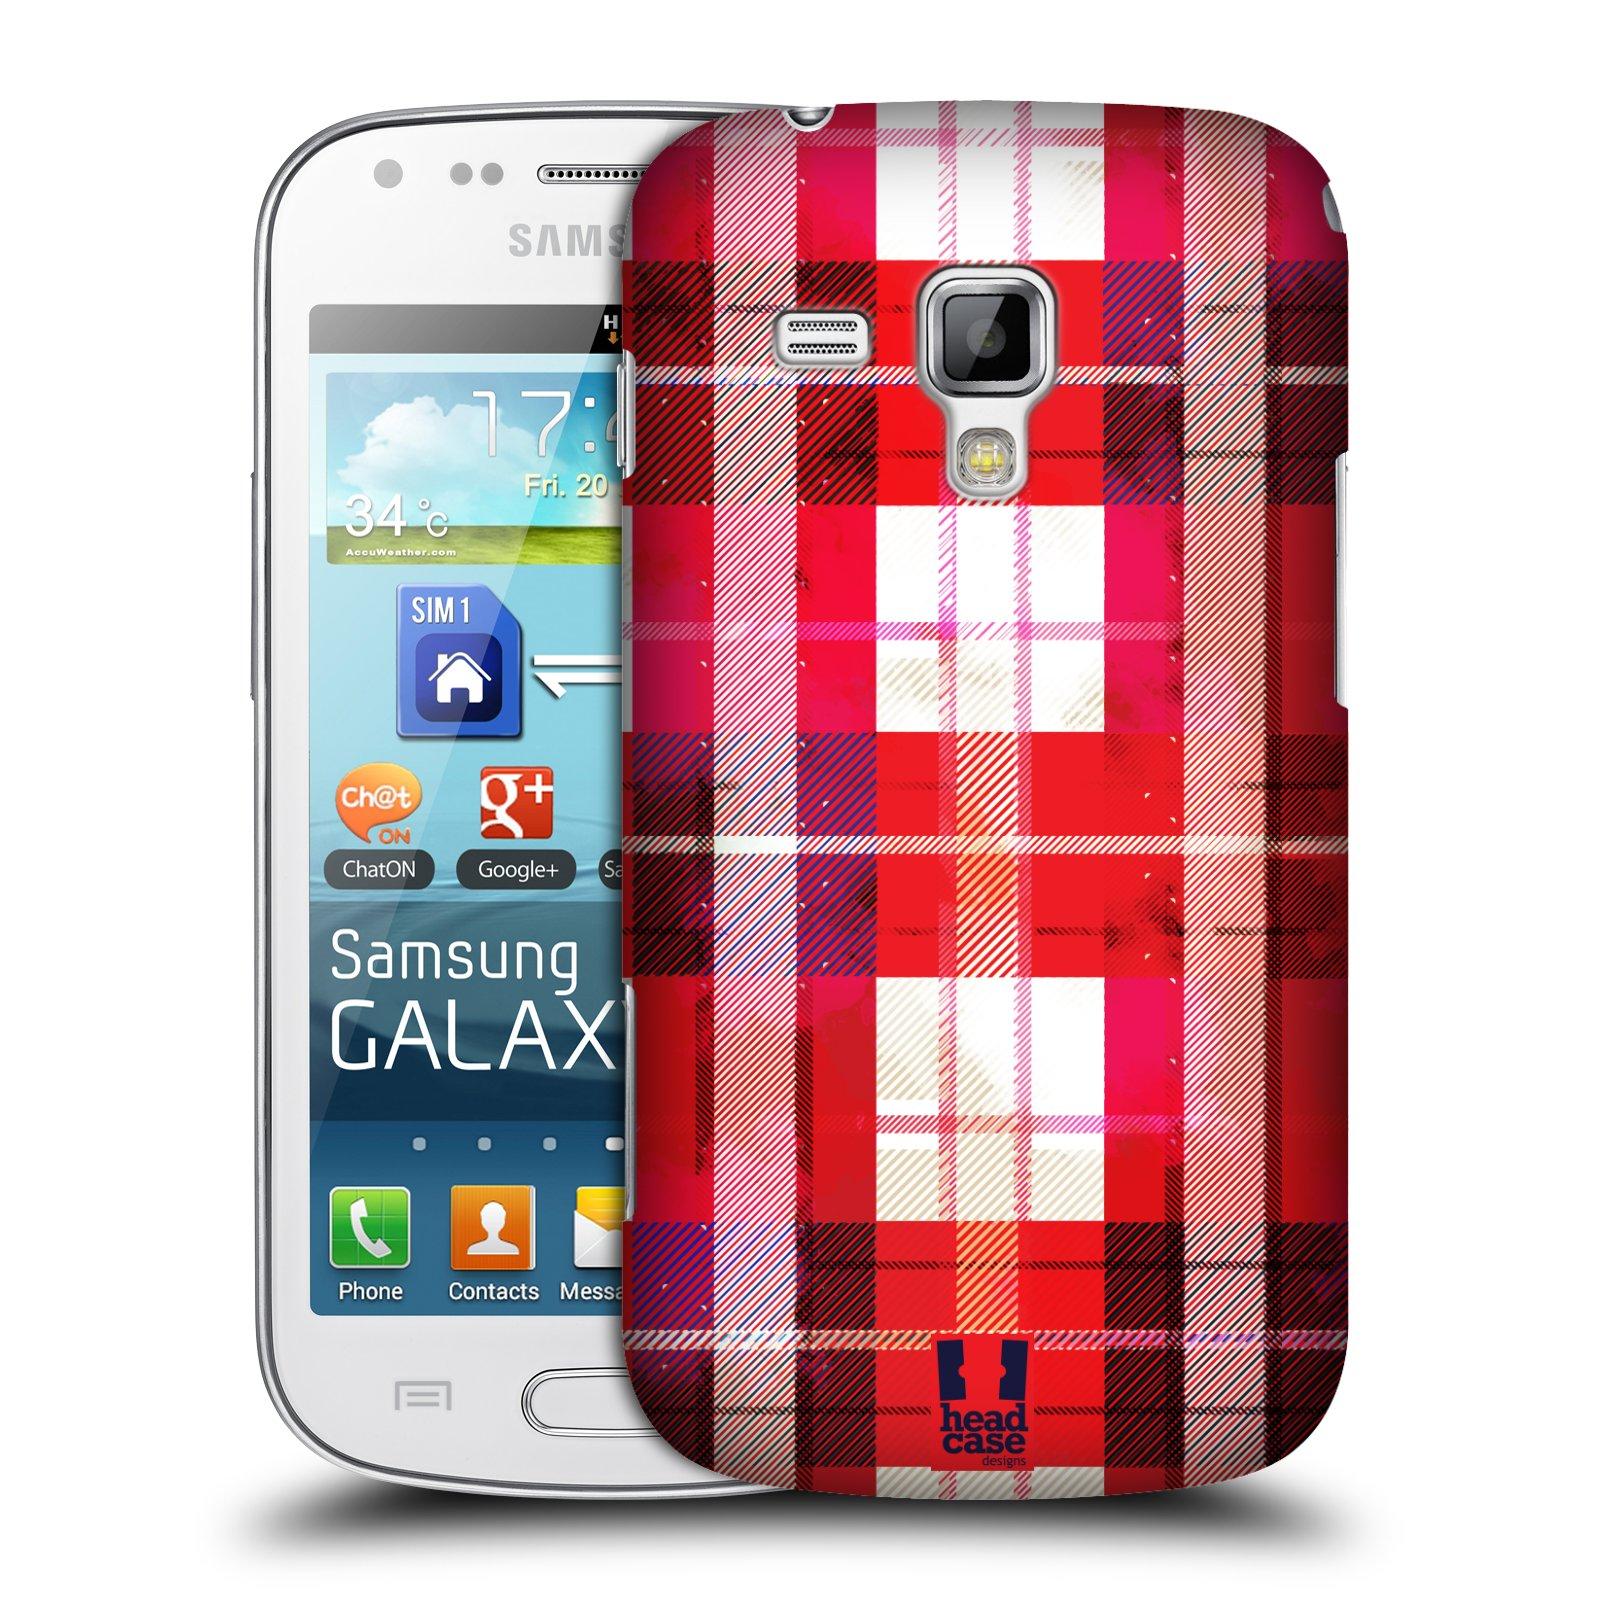 Plastové pouzdro na mobil Samsung Galaxy Trend HEAD CASE FLANEL RED (Kryt či obal na mobilní telefon Samsung Galaxy Trend GT-S7560)